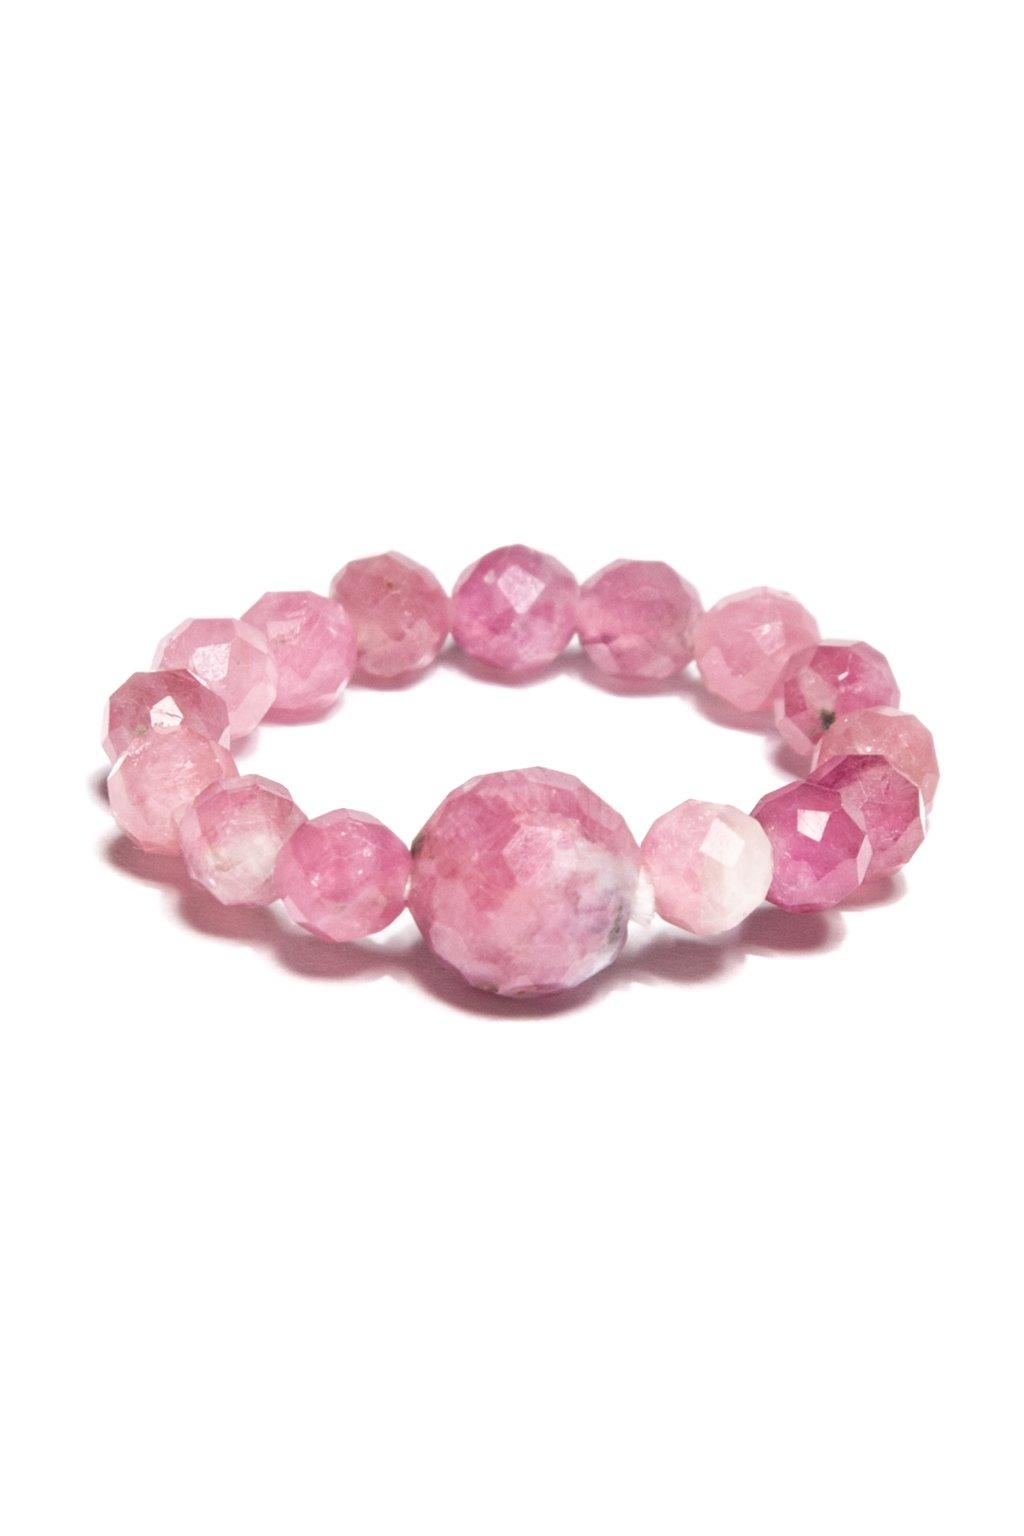 Dámsky prsteň z ružového turmalínu